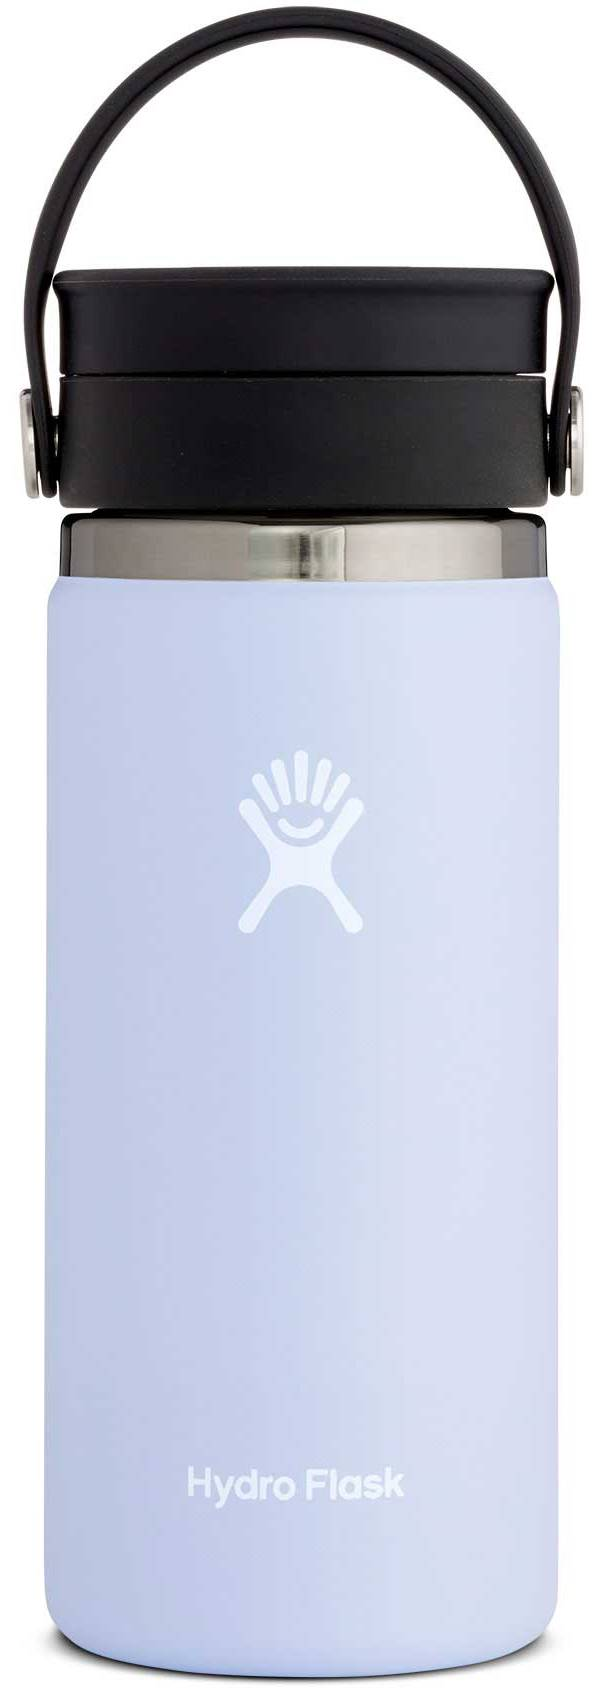 Hydro Flask Flex Sip 16 oz. Bottle product image